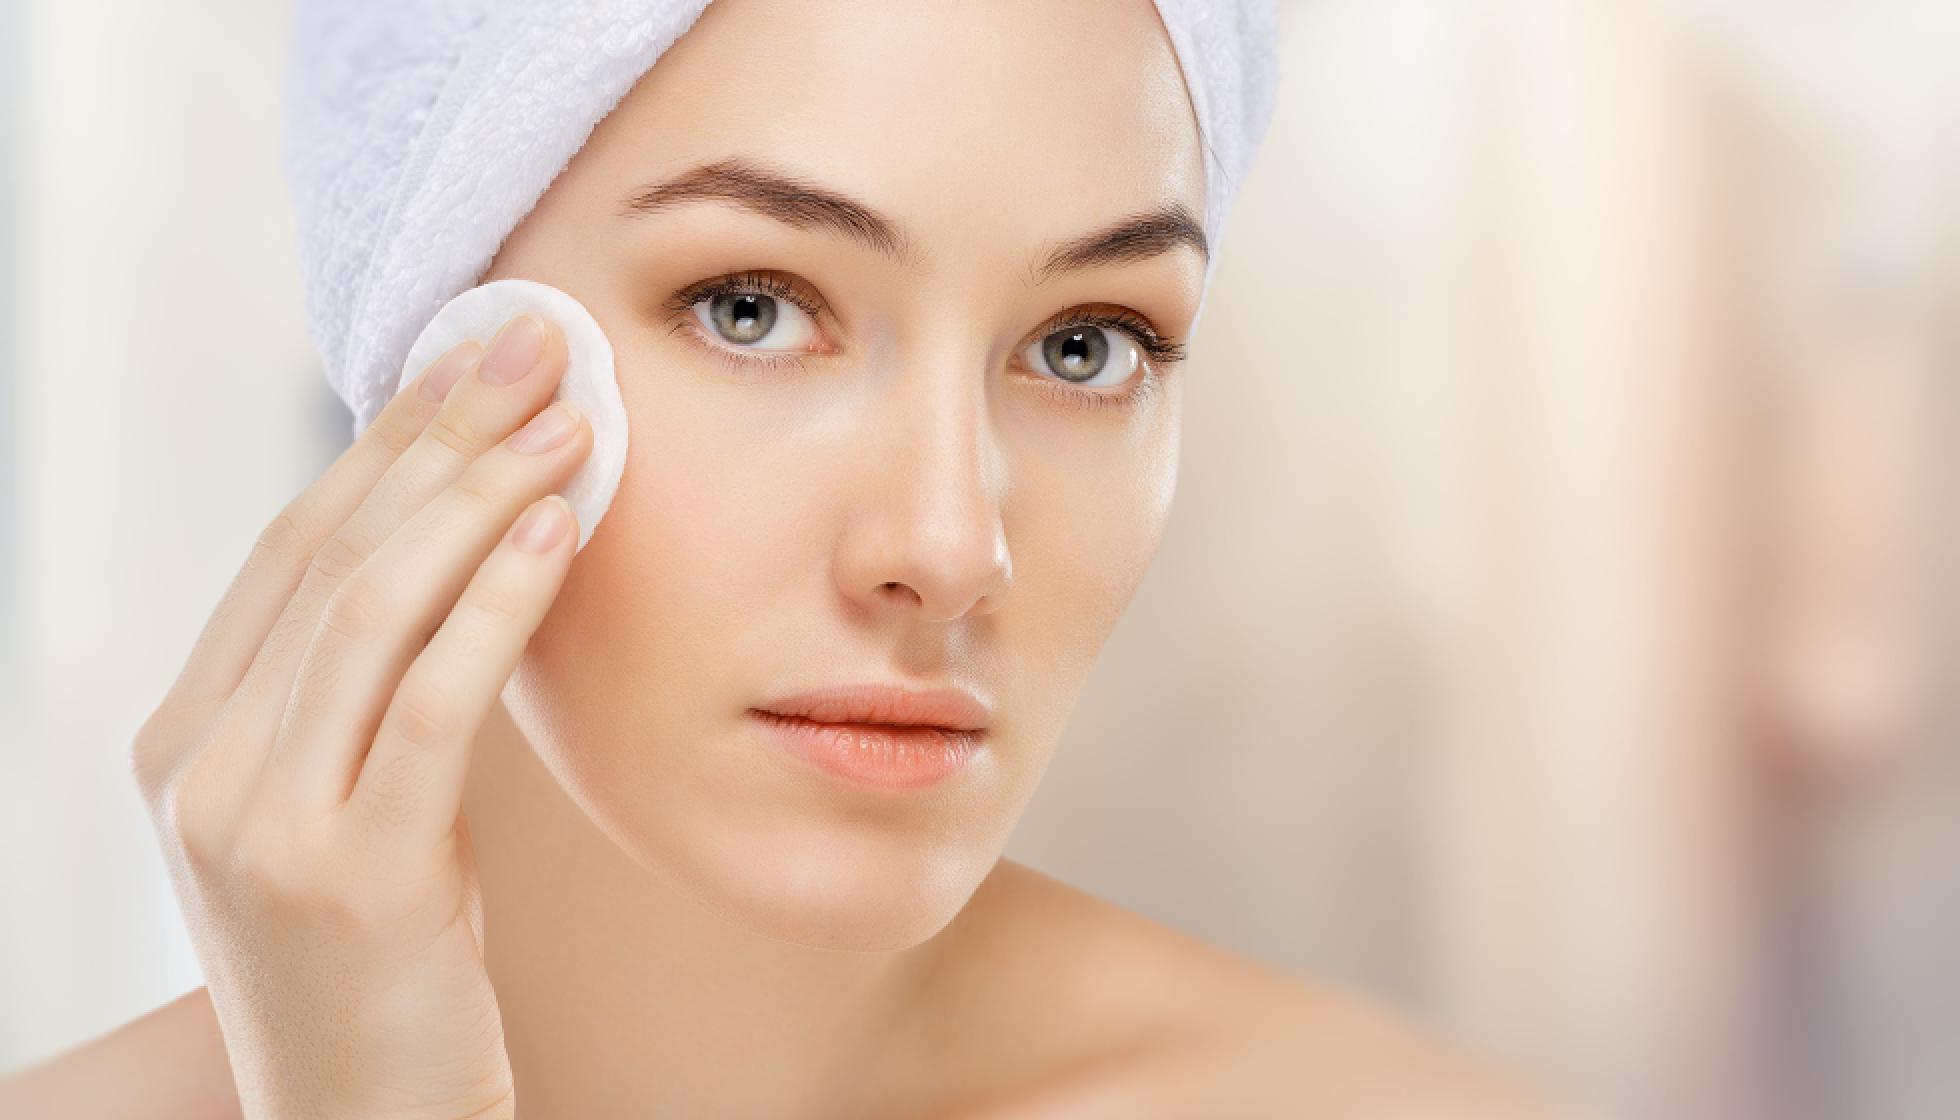 Снятие макияжа в домашних условиях